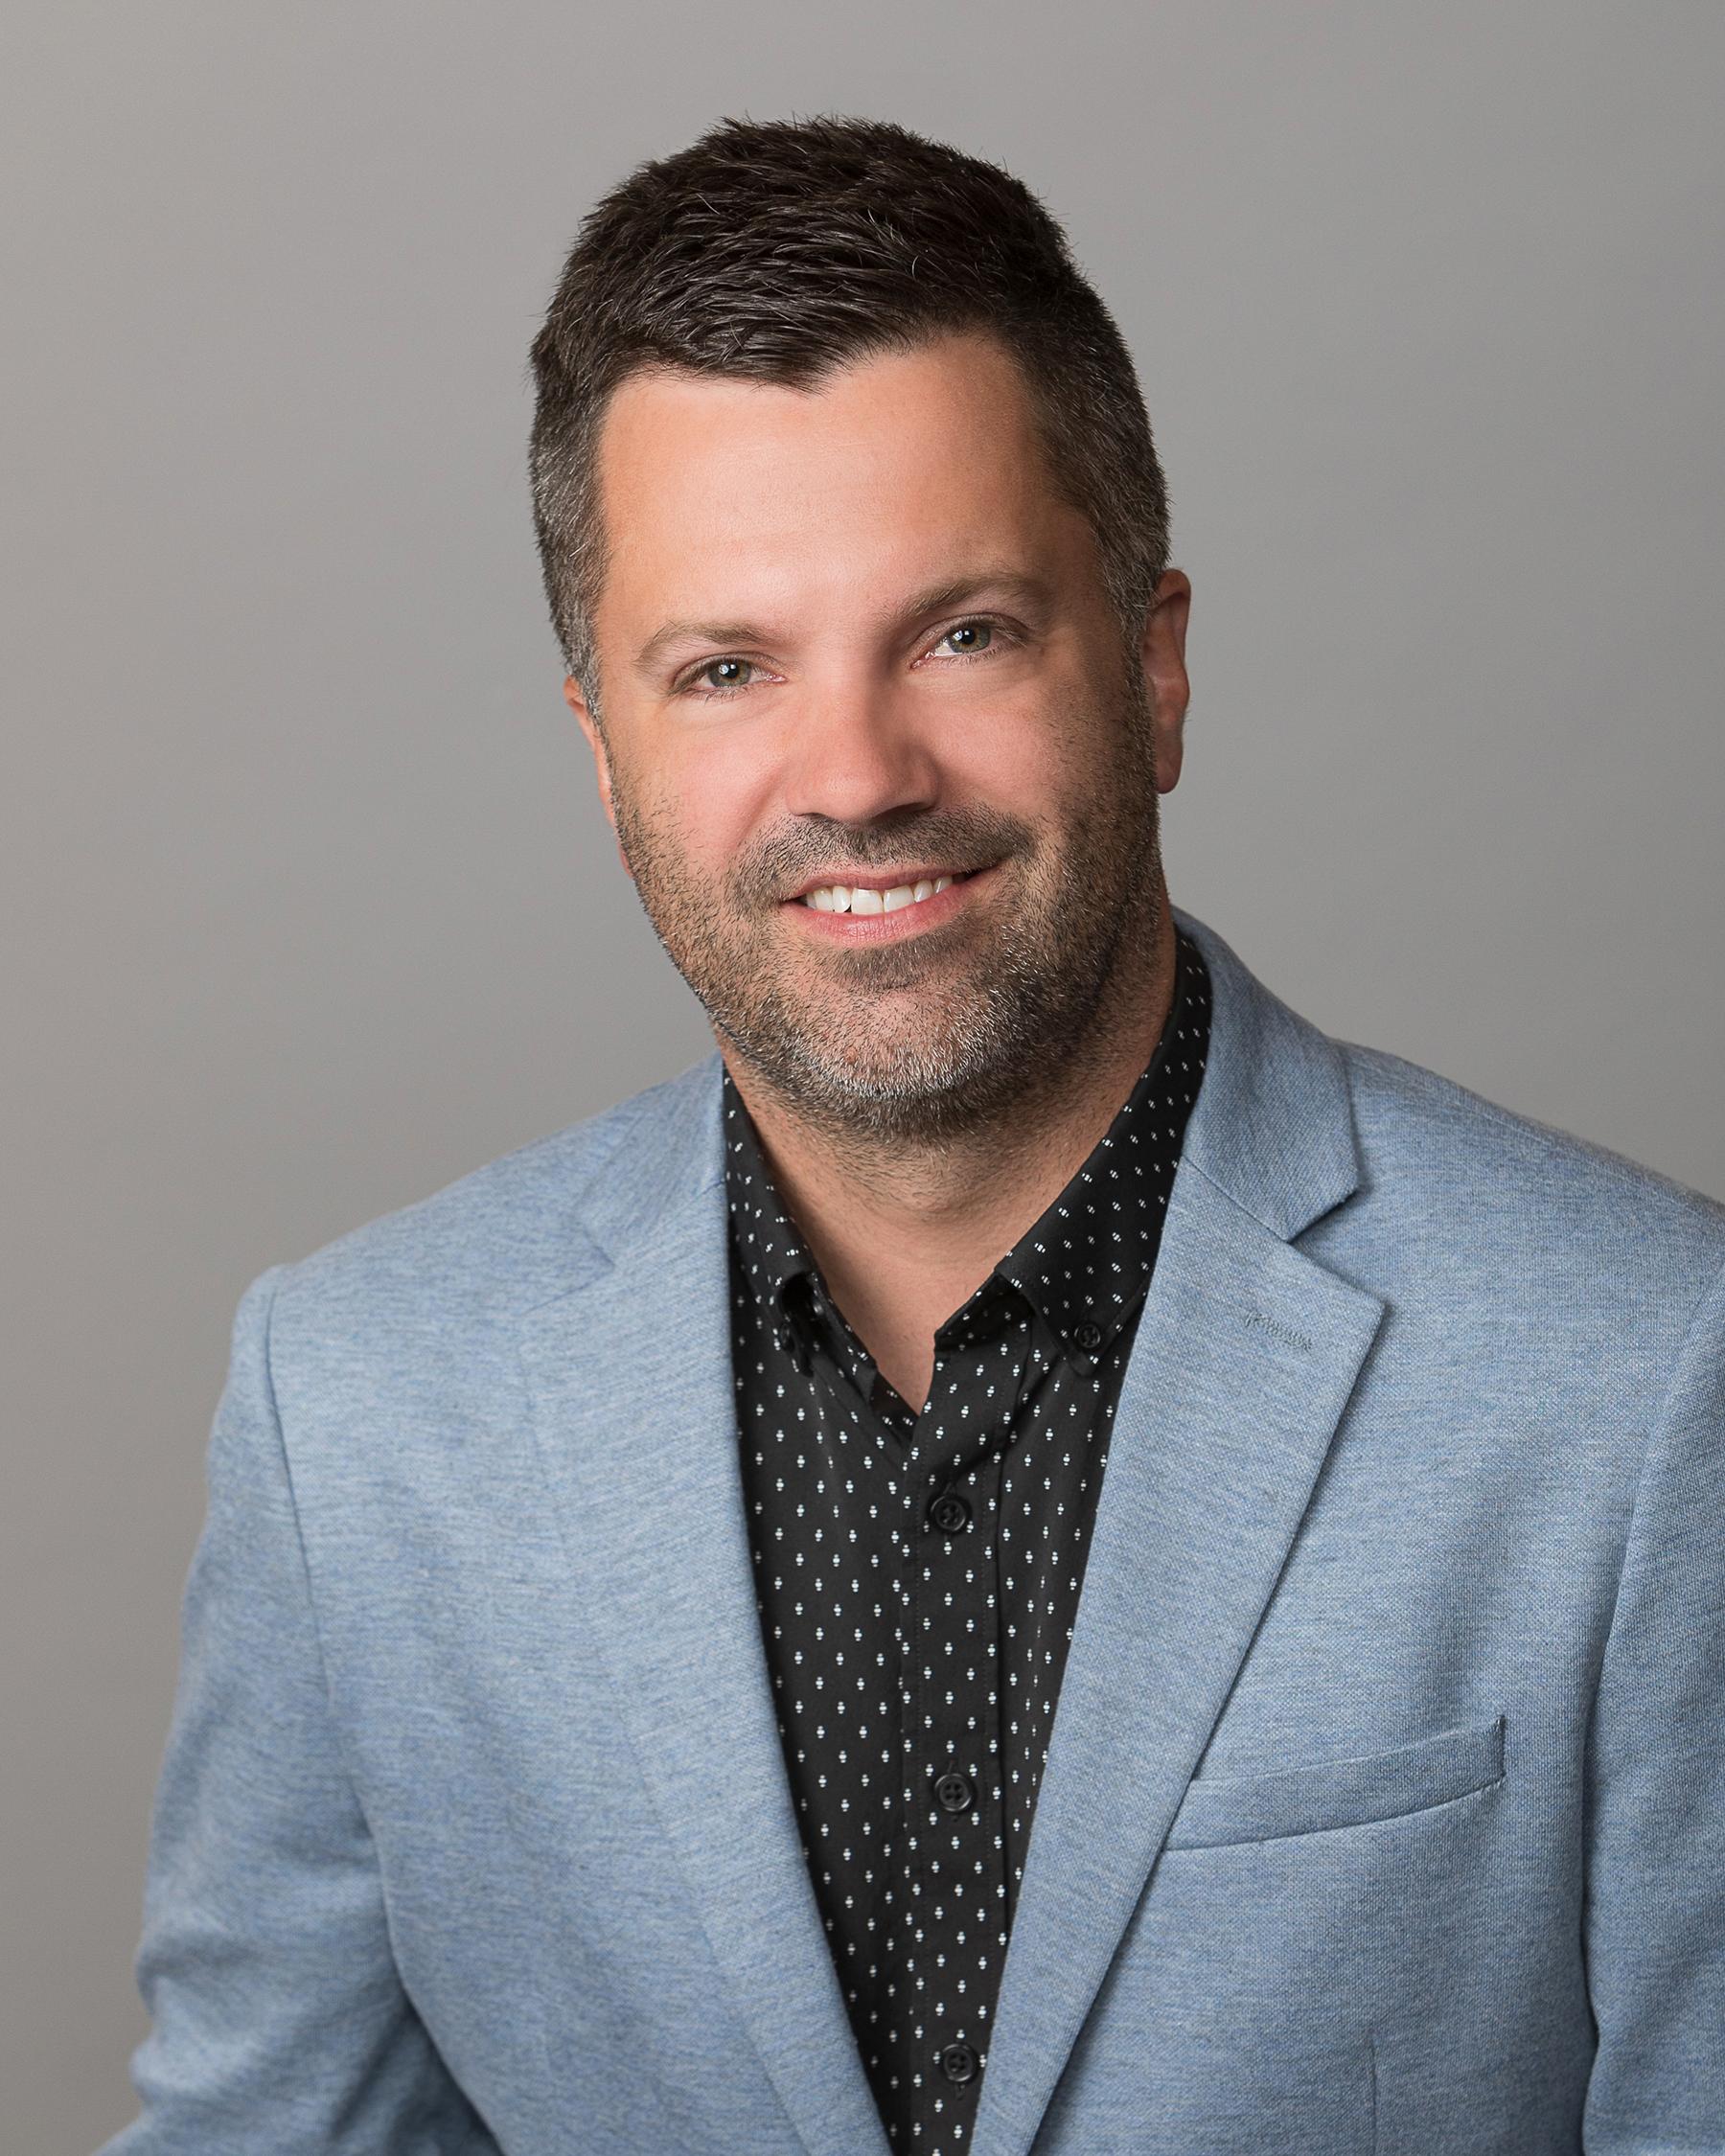 Rob Kurtenbach